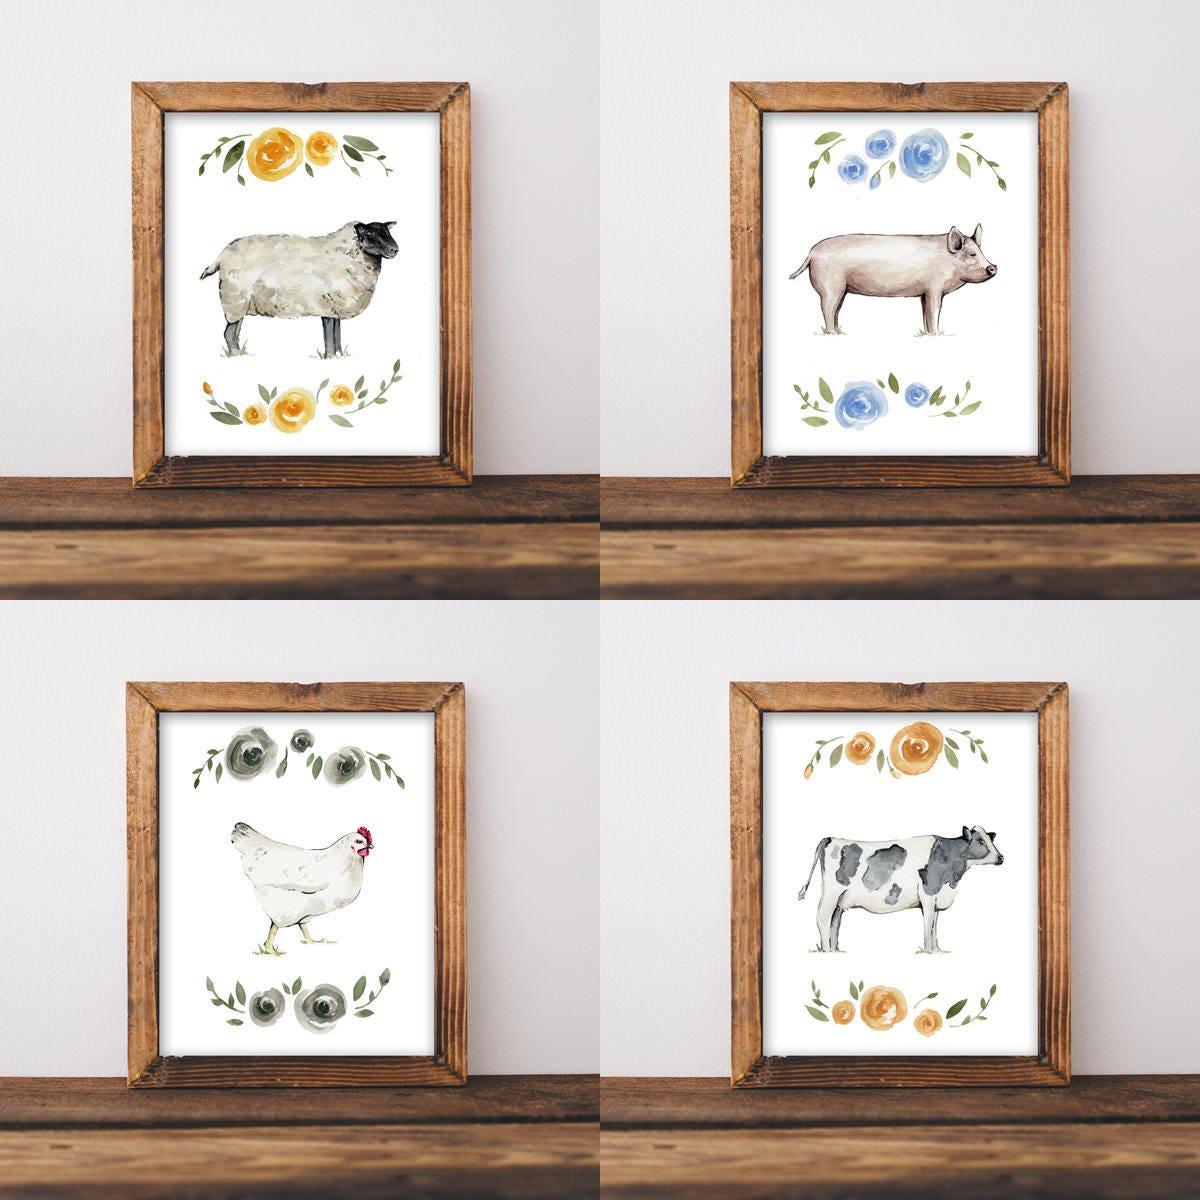 Chic Wall Art farmhouse wall art, nursery wall art, shabby chic wall art, animal